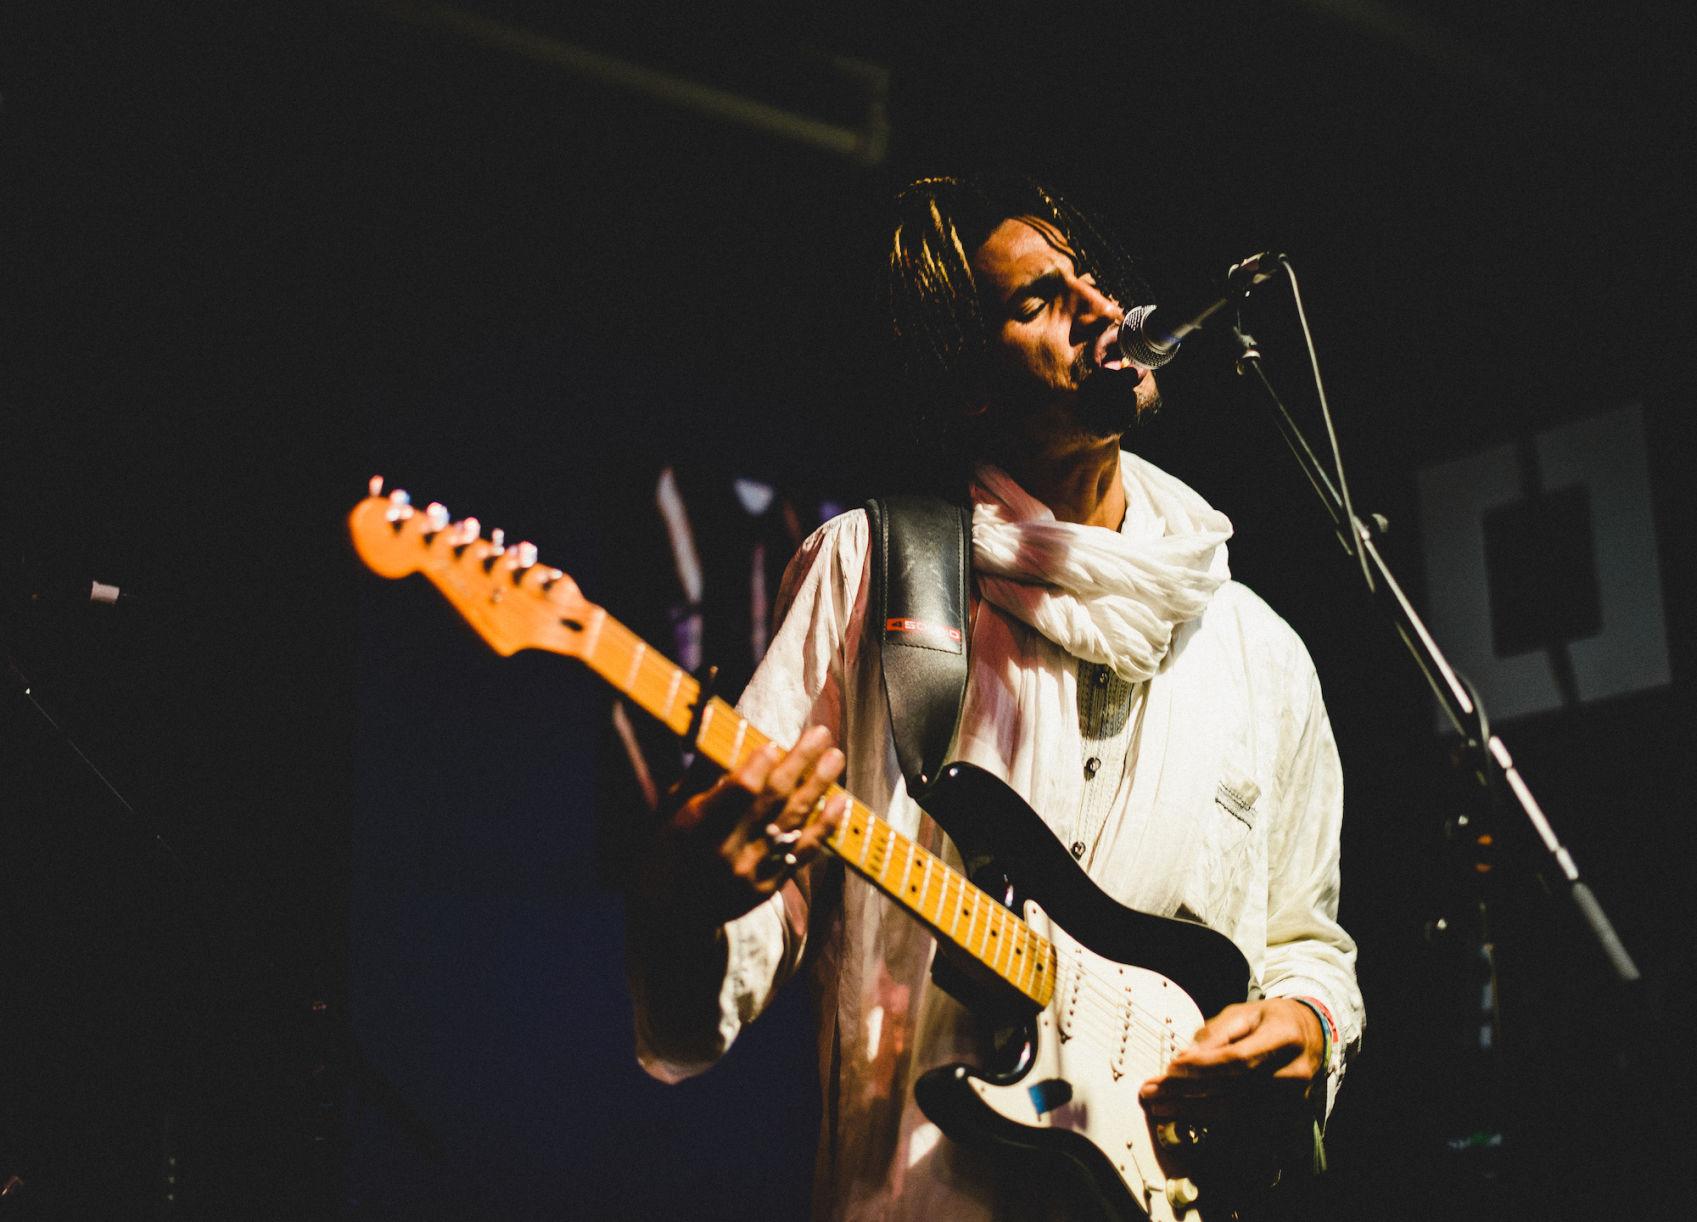 Nigerian guitarist Mdou Moctar plays mix of Tuareg music and rock at One Eyed Jacks Thursday